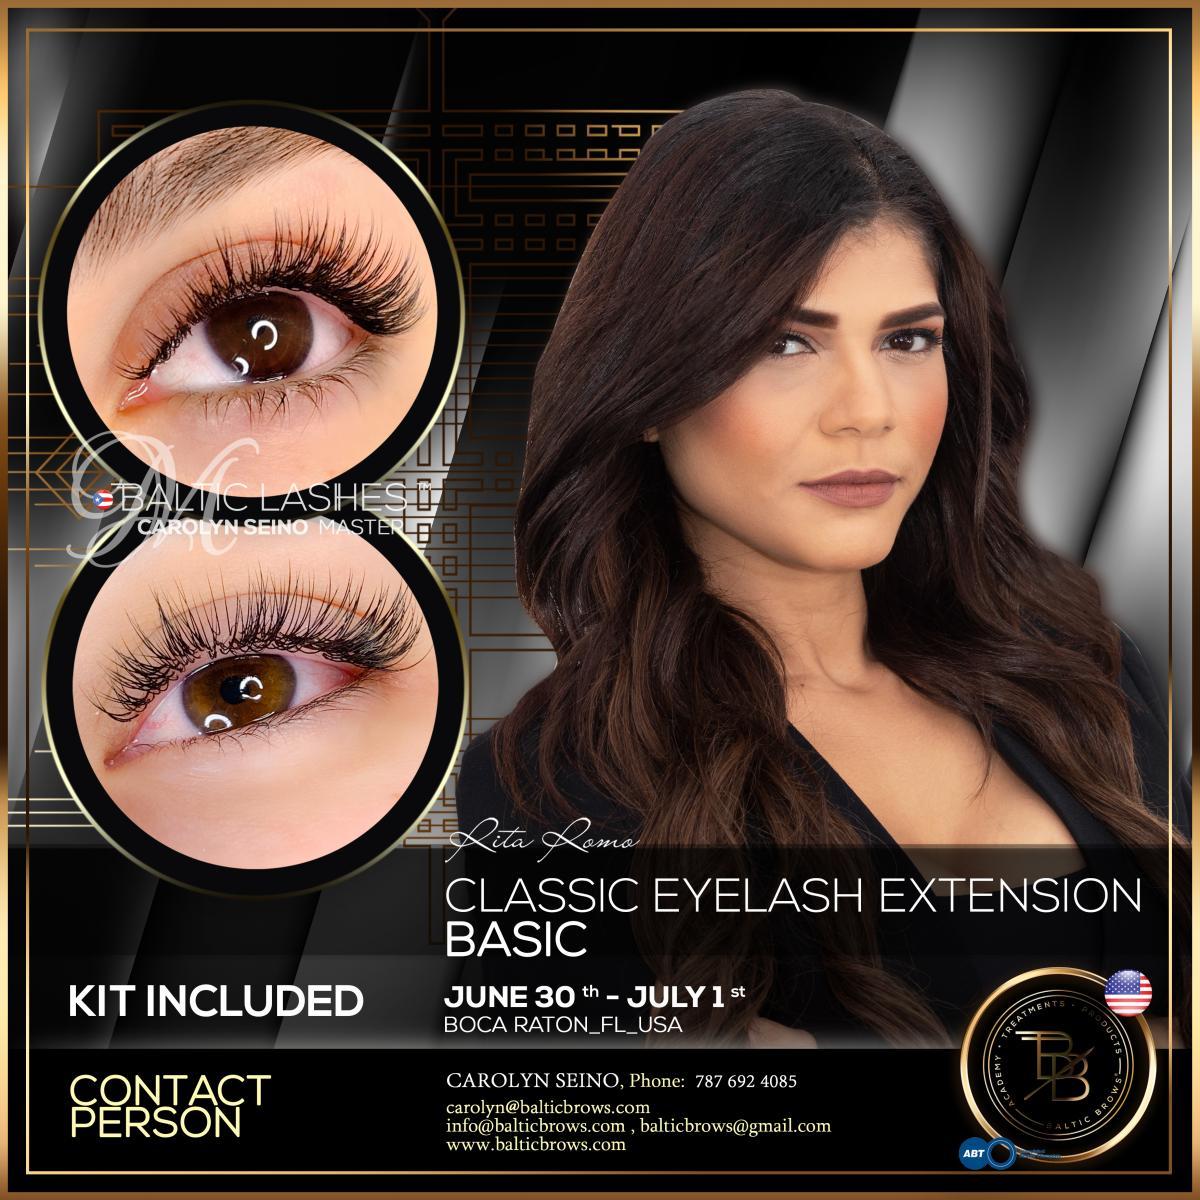 Basic class of classic eyelash extension